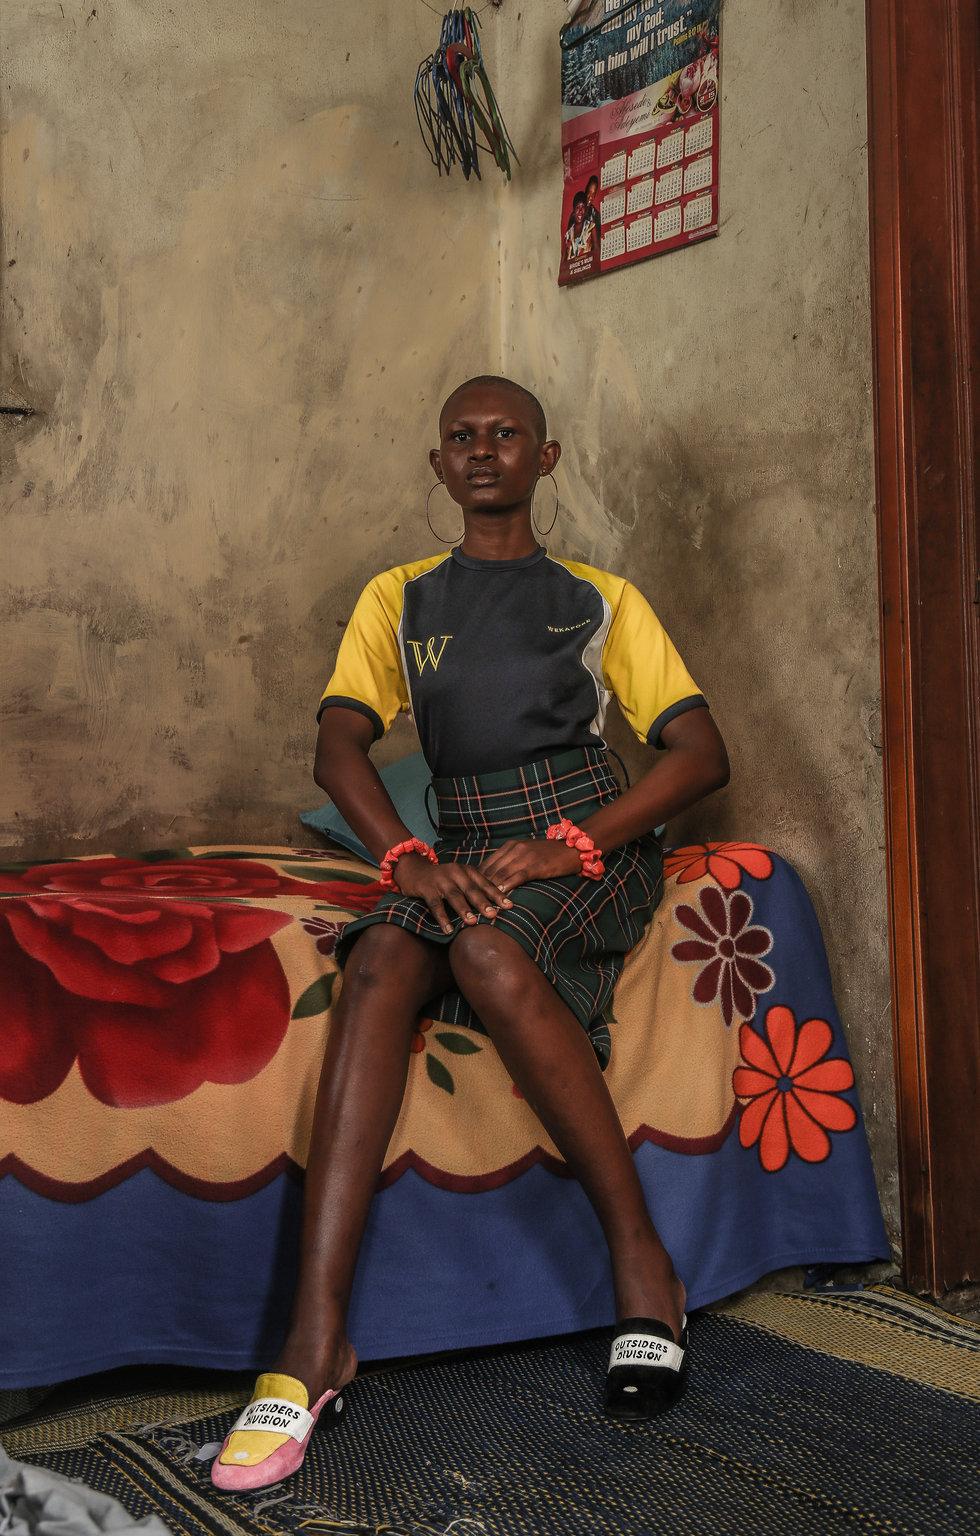 Yagazie Emezi: The Nigerian Photographer Documenting African Life